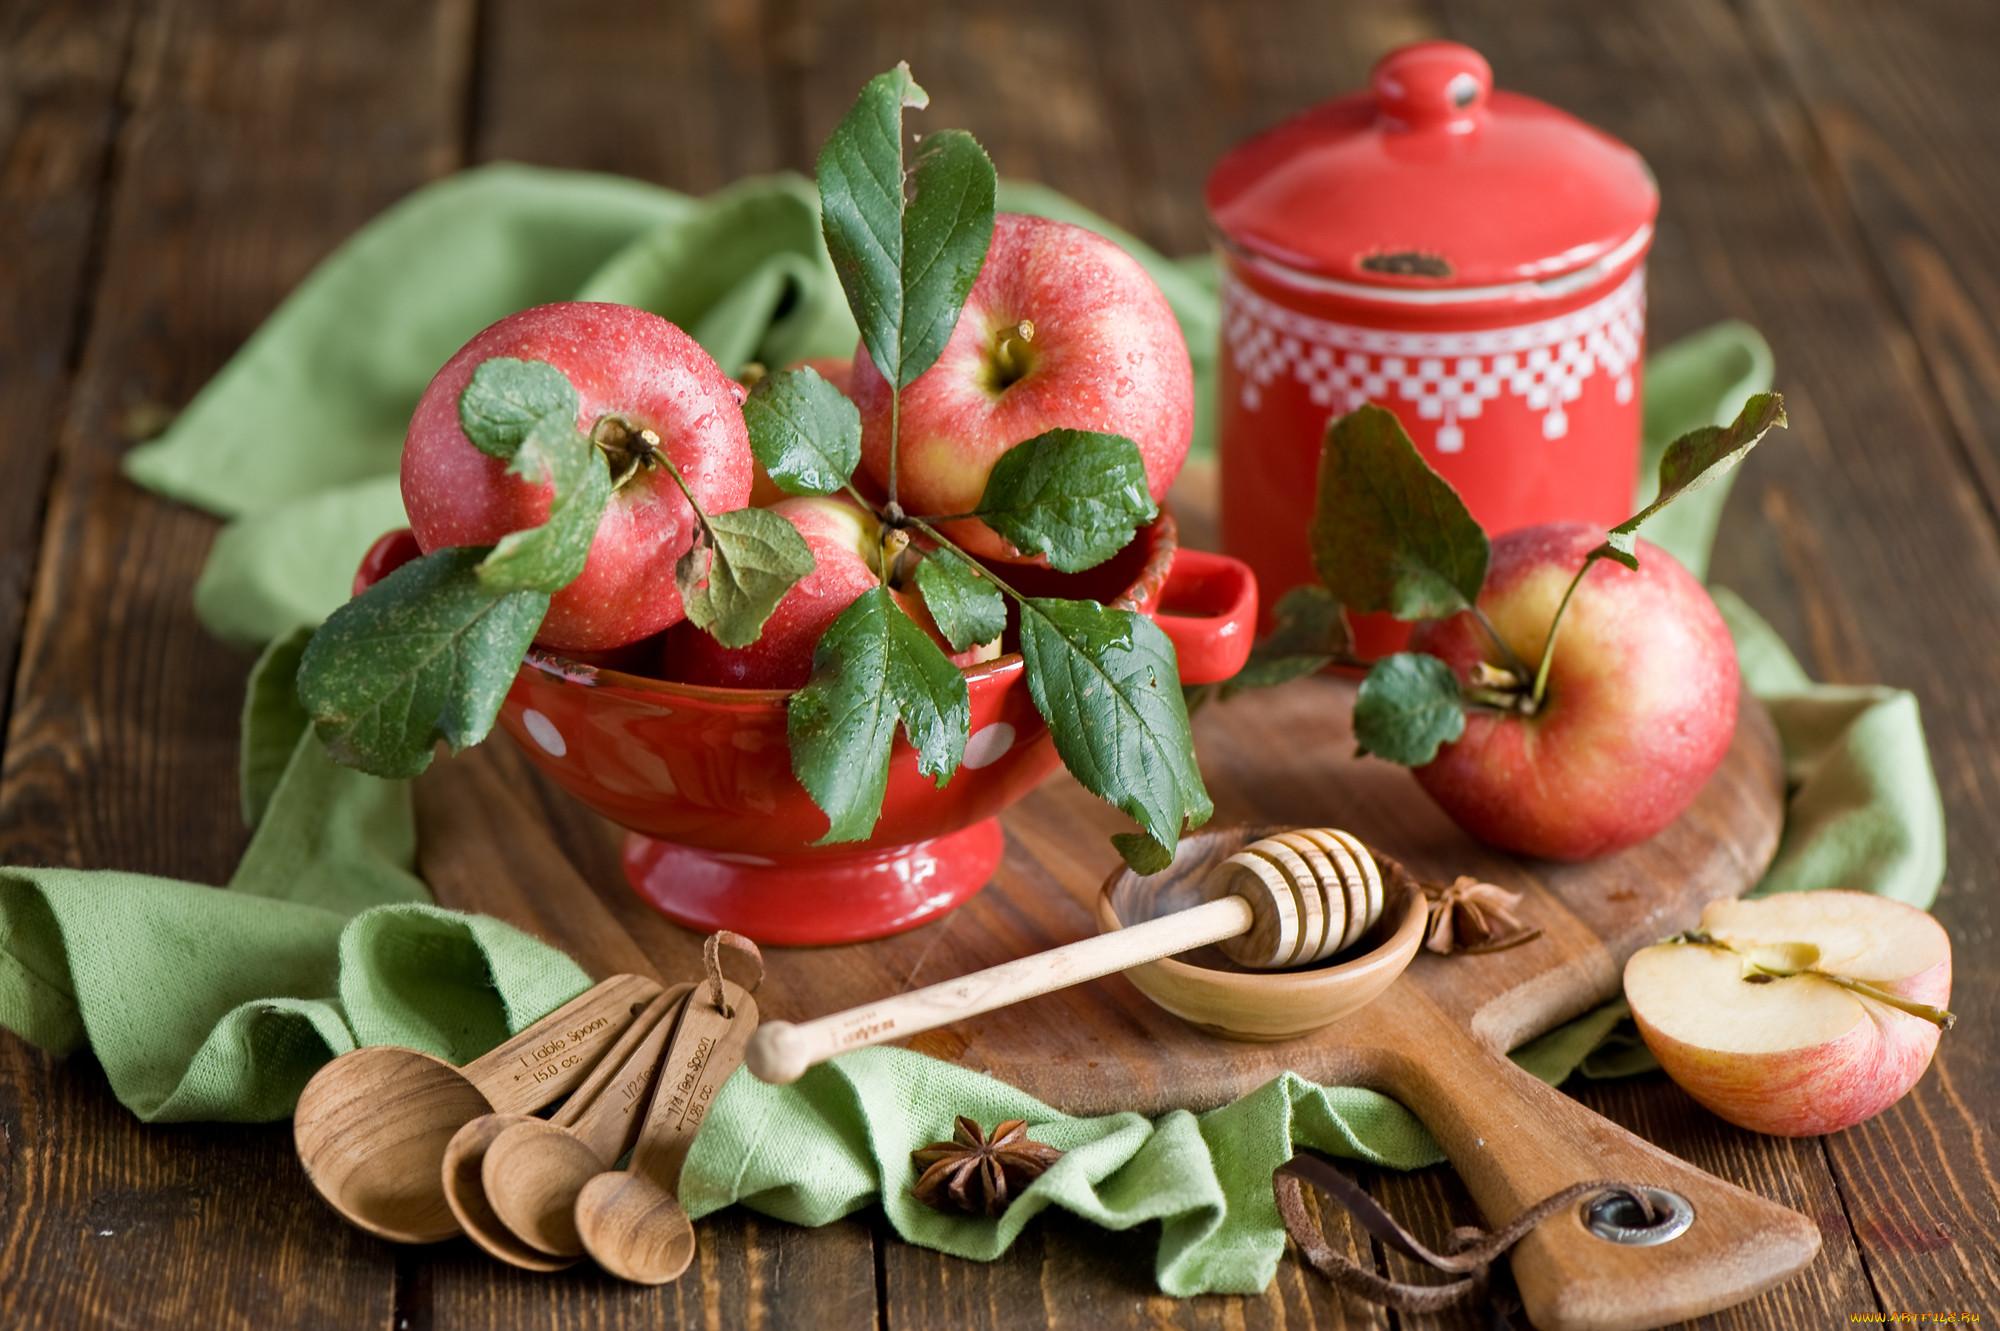 еда из яблок картинки давно сидишь